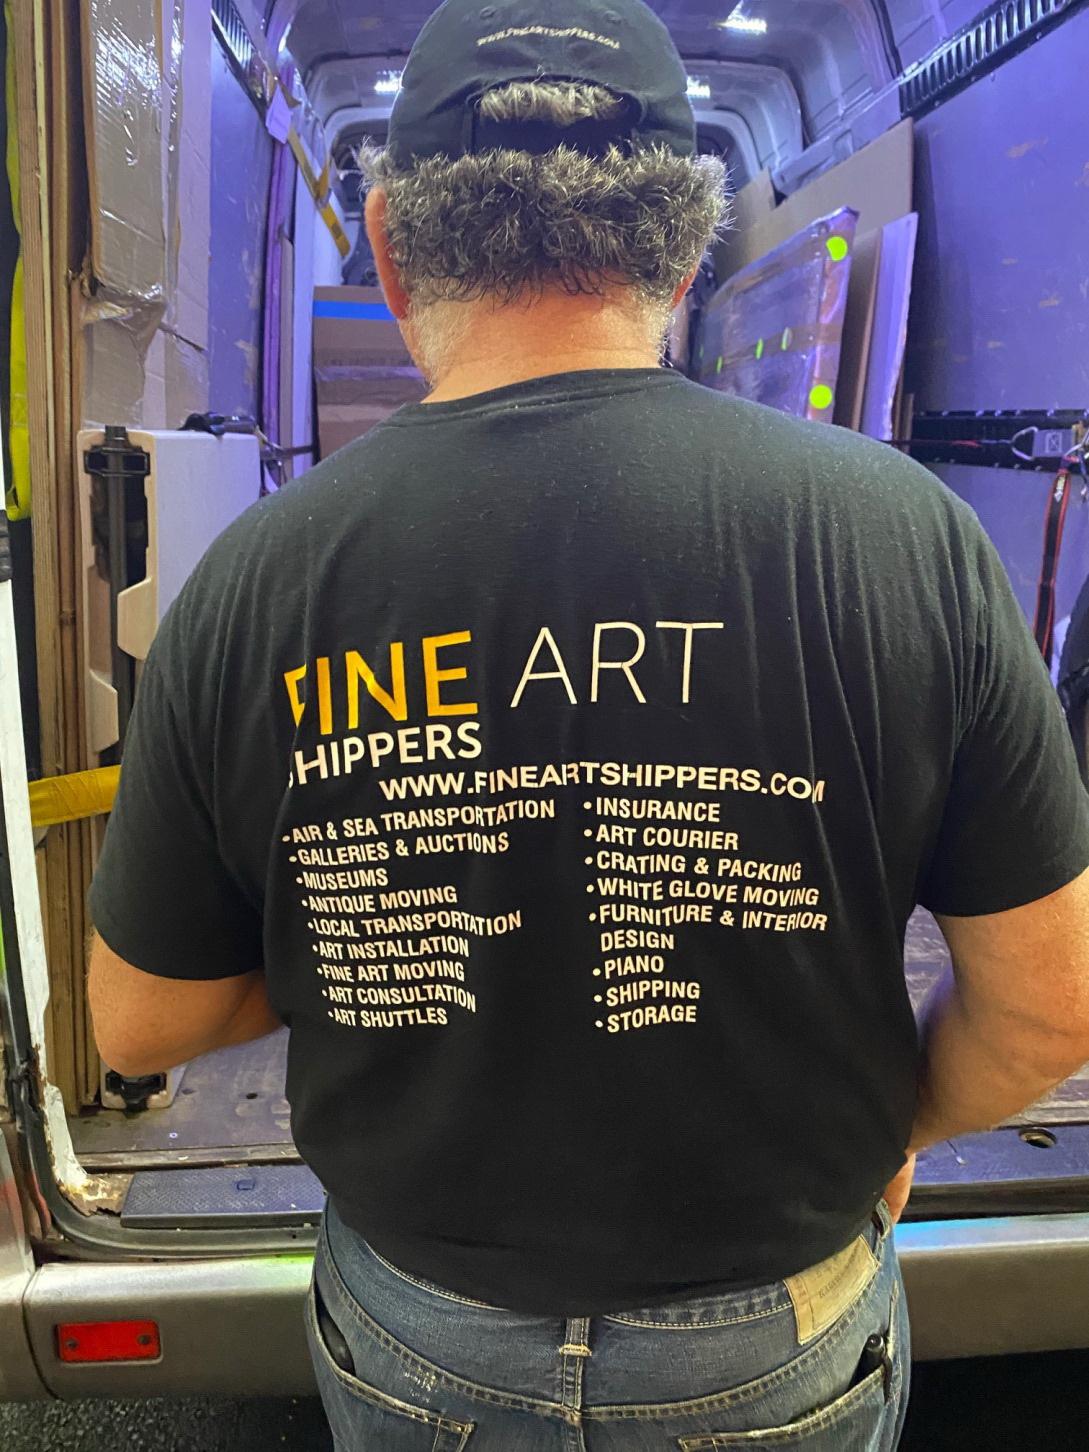 Art shuttle services